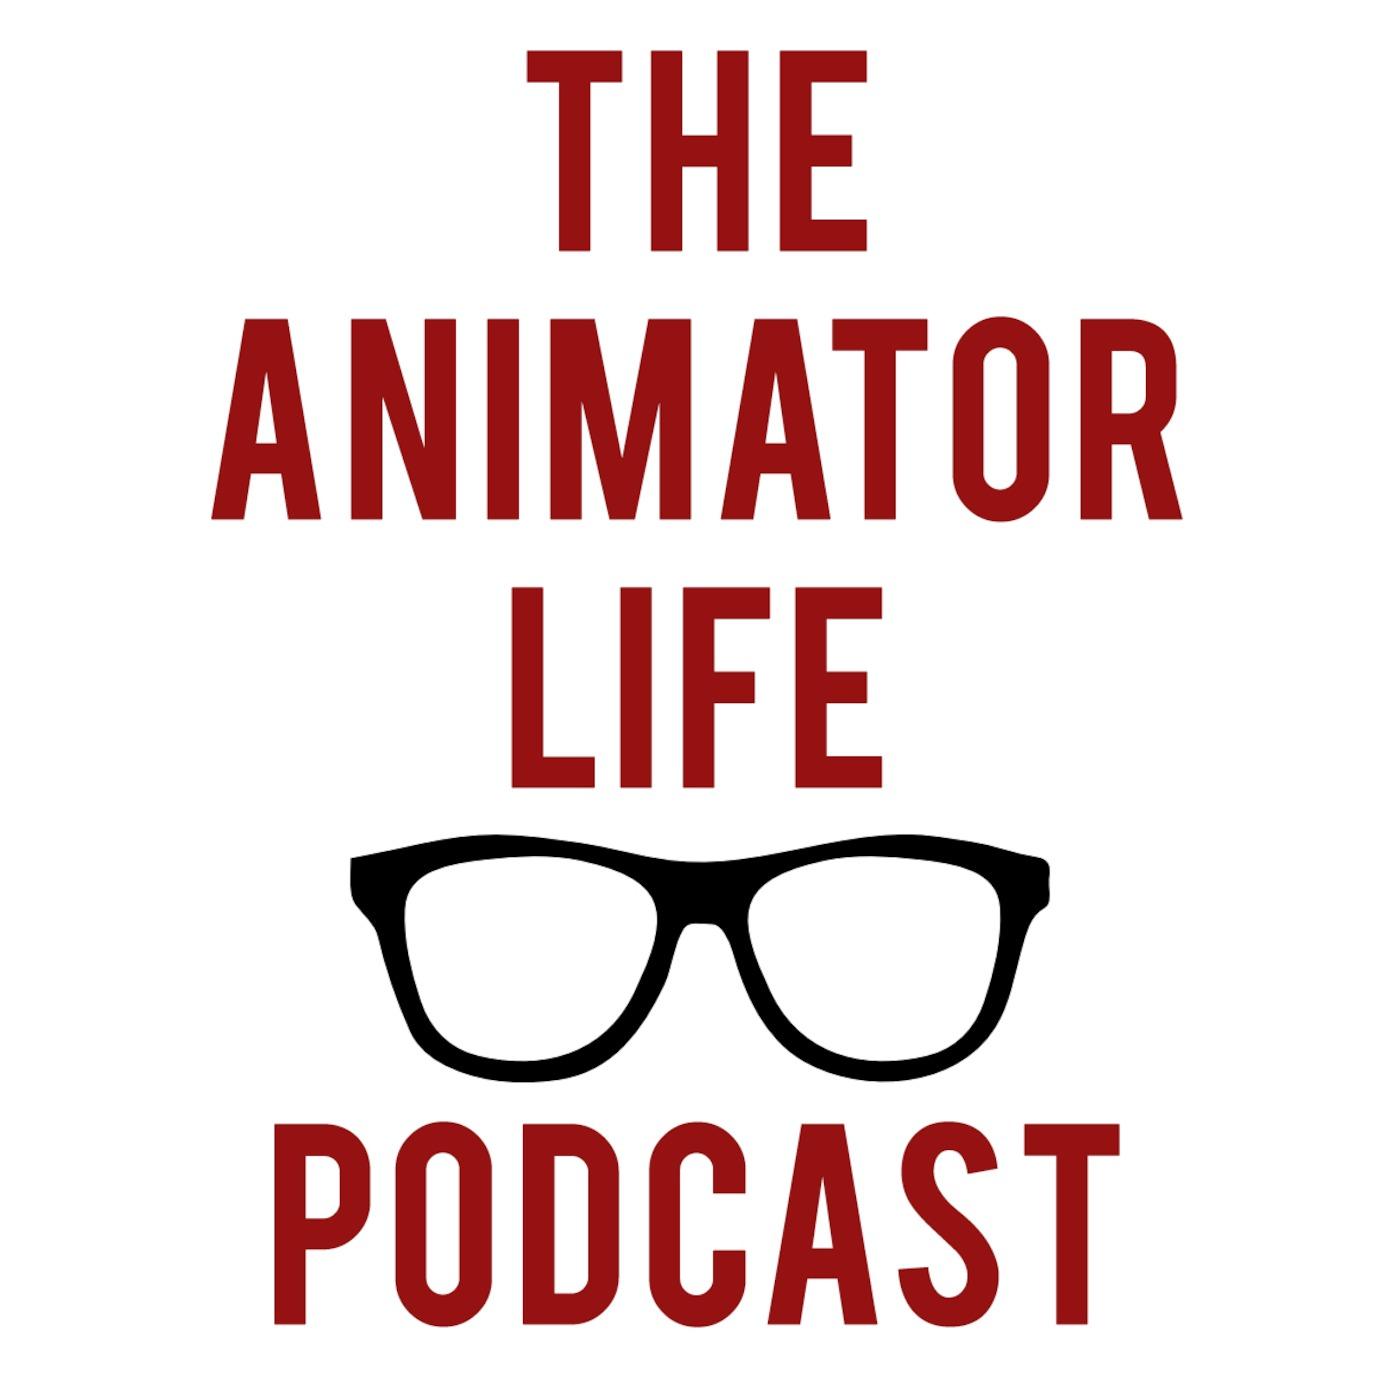 The Animator Life